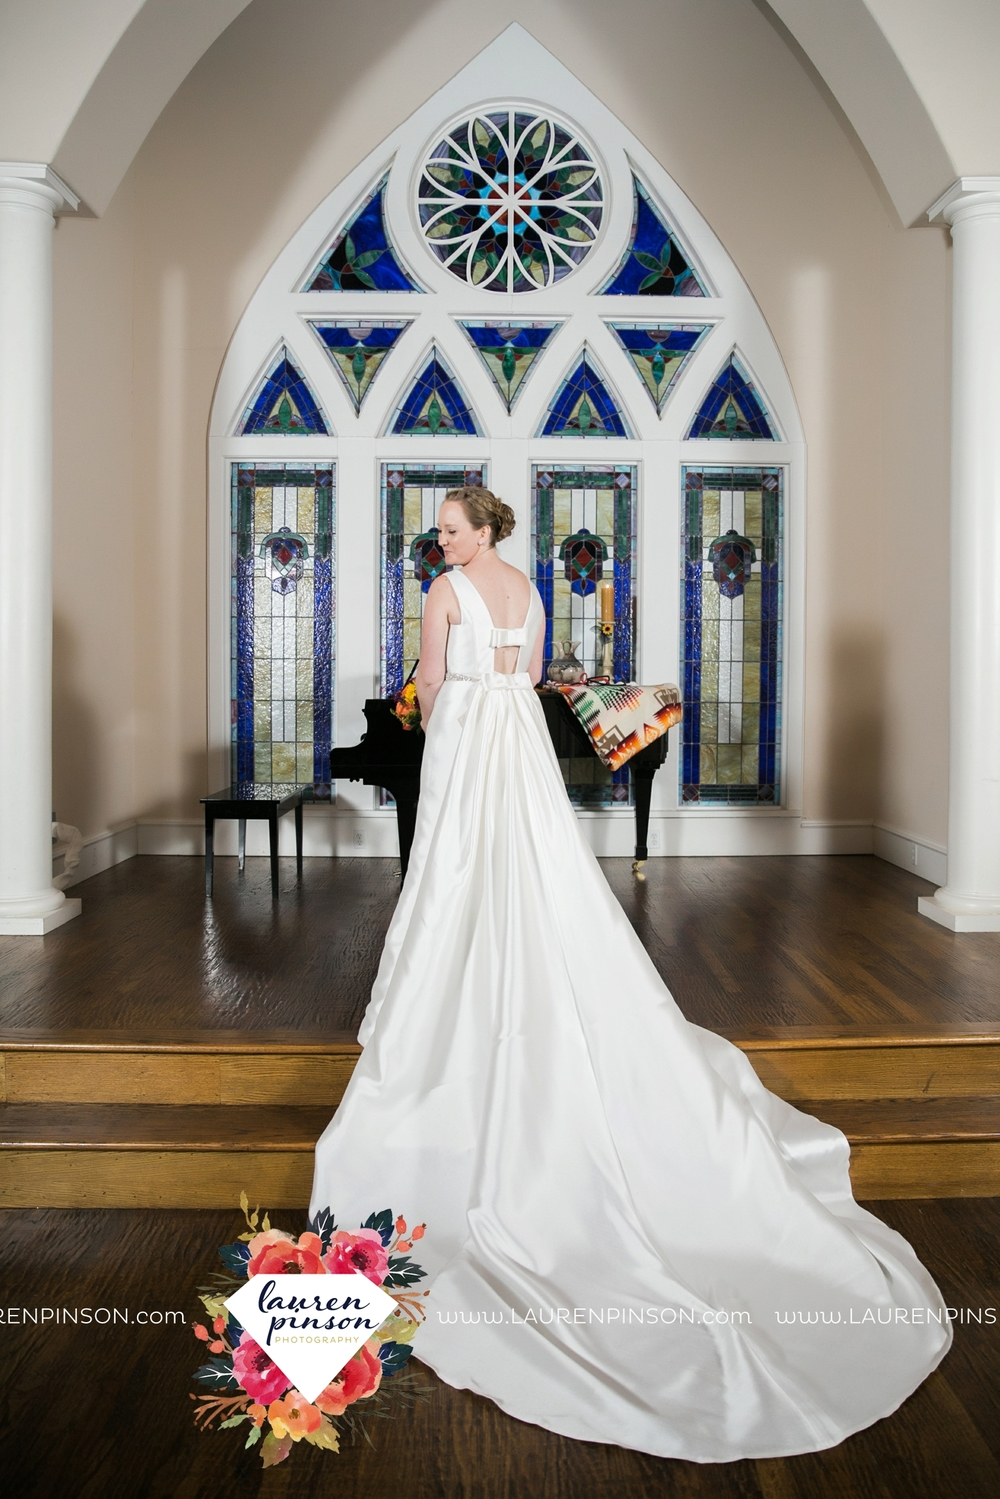 bells-texas-wedding-photography-at-willowood-ranch-chapel-north-texas-wichita-falls-wedding-photographer_1884.jpg